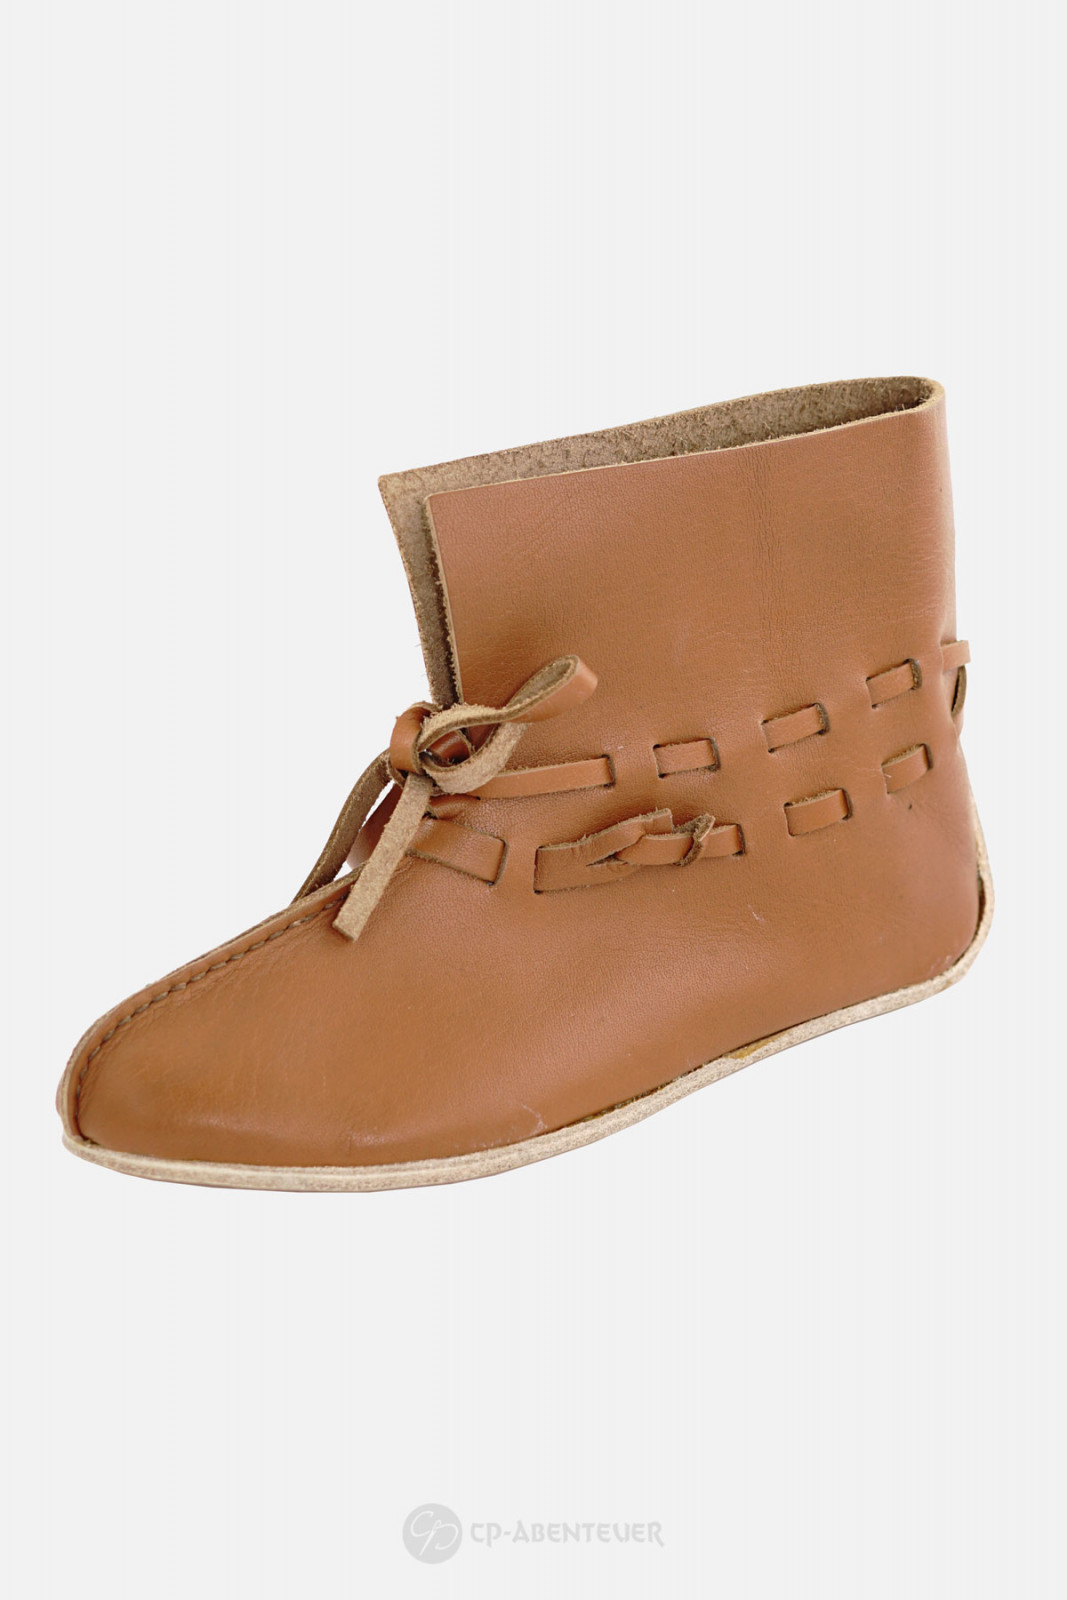 Odin - Schuhe